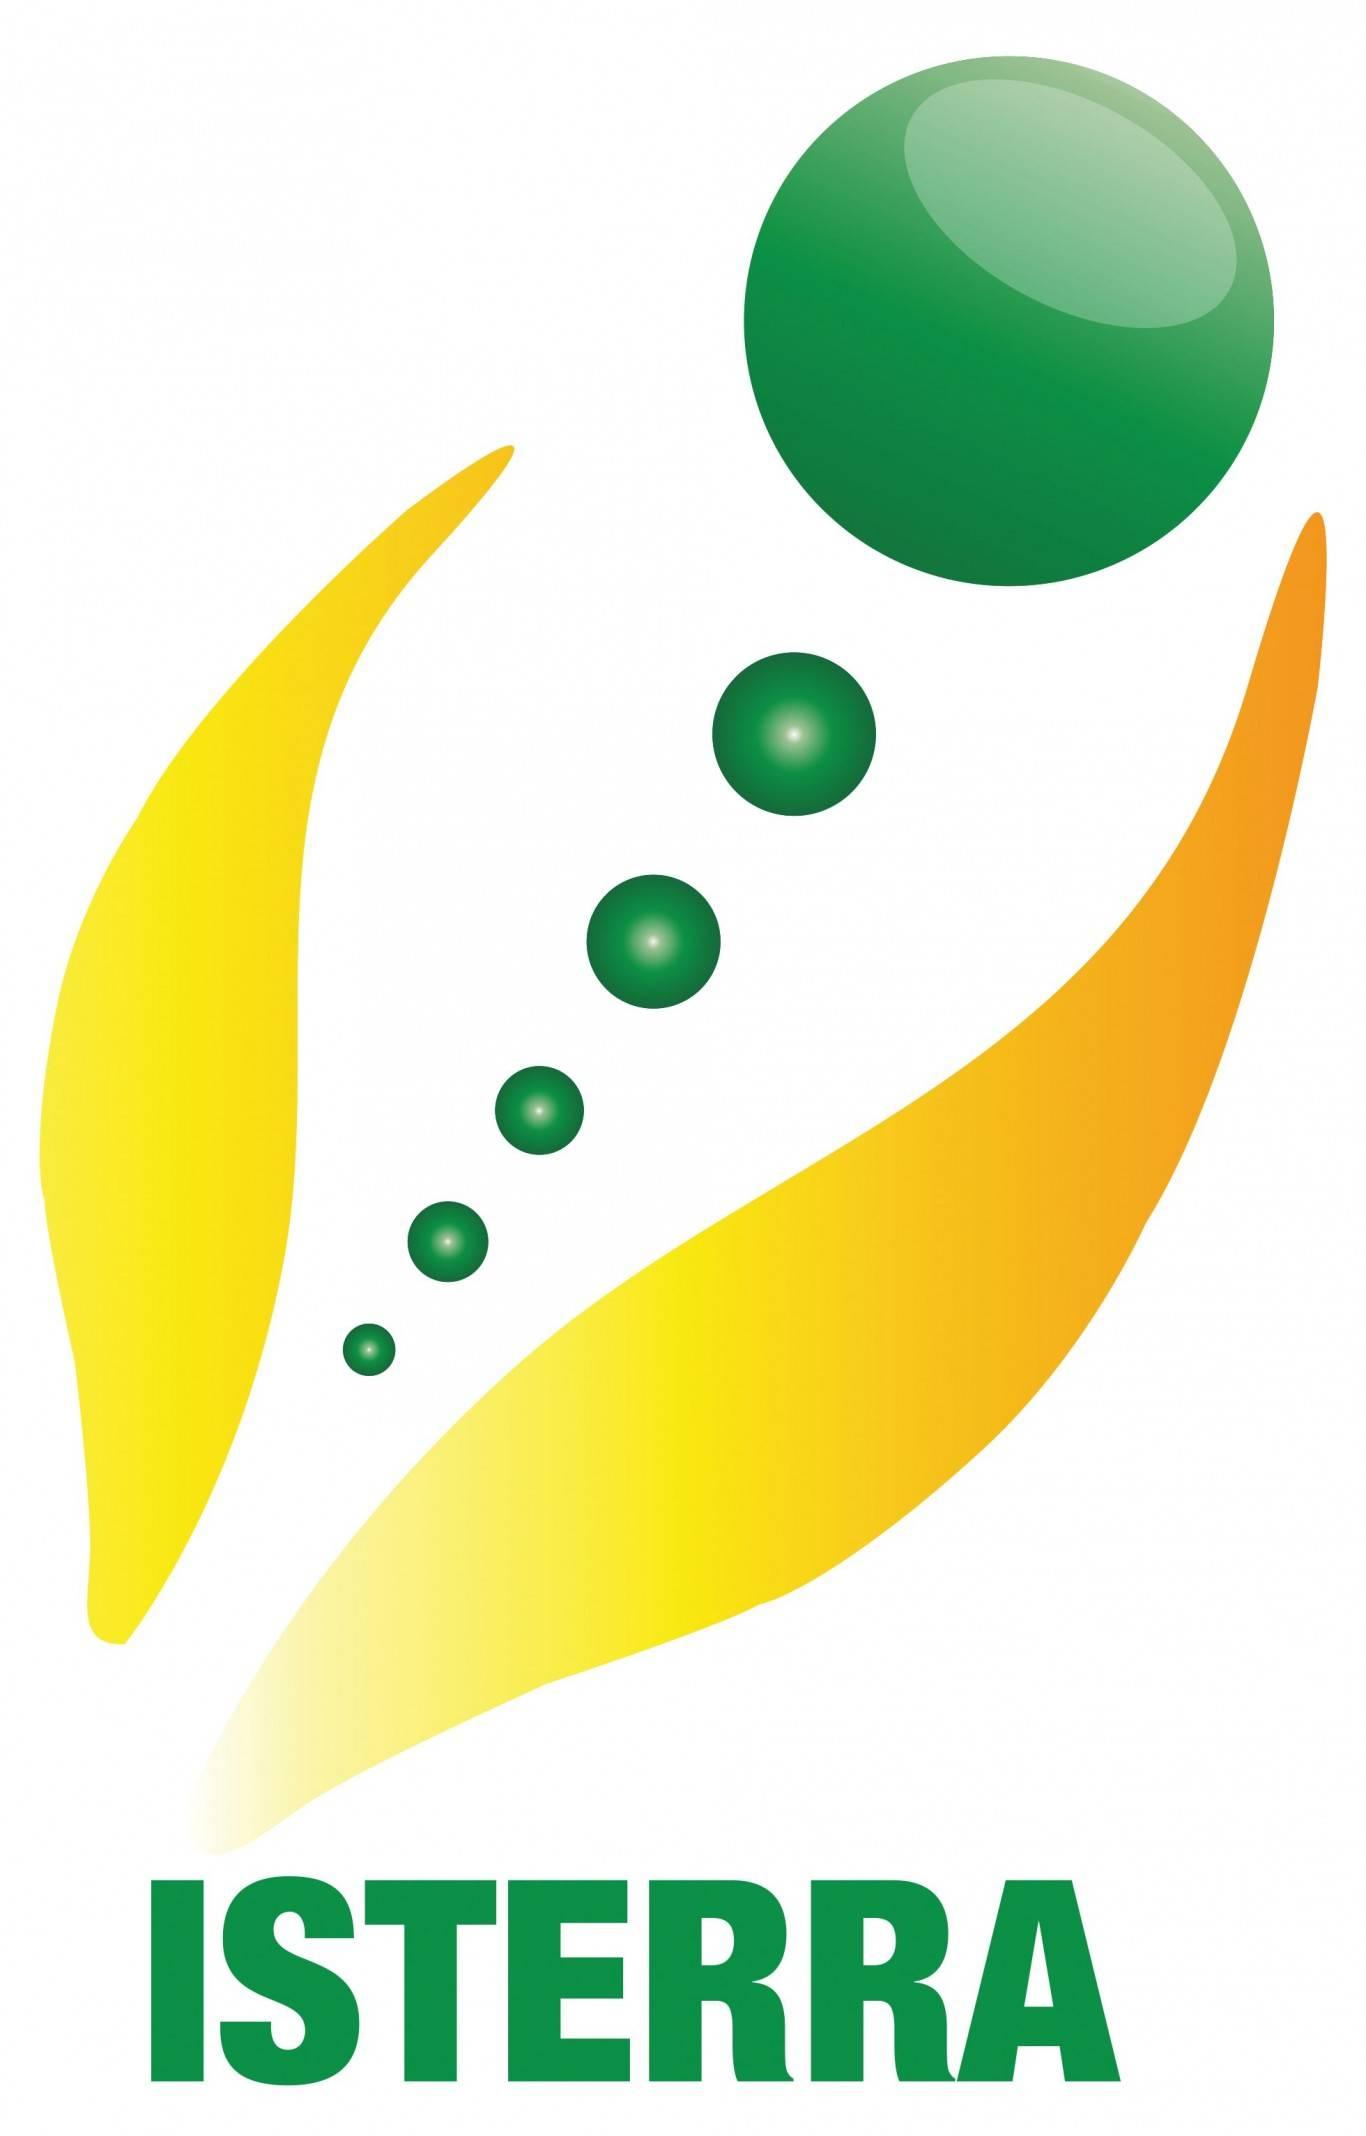 isterra logo